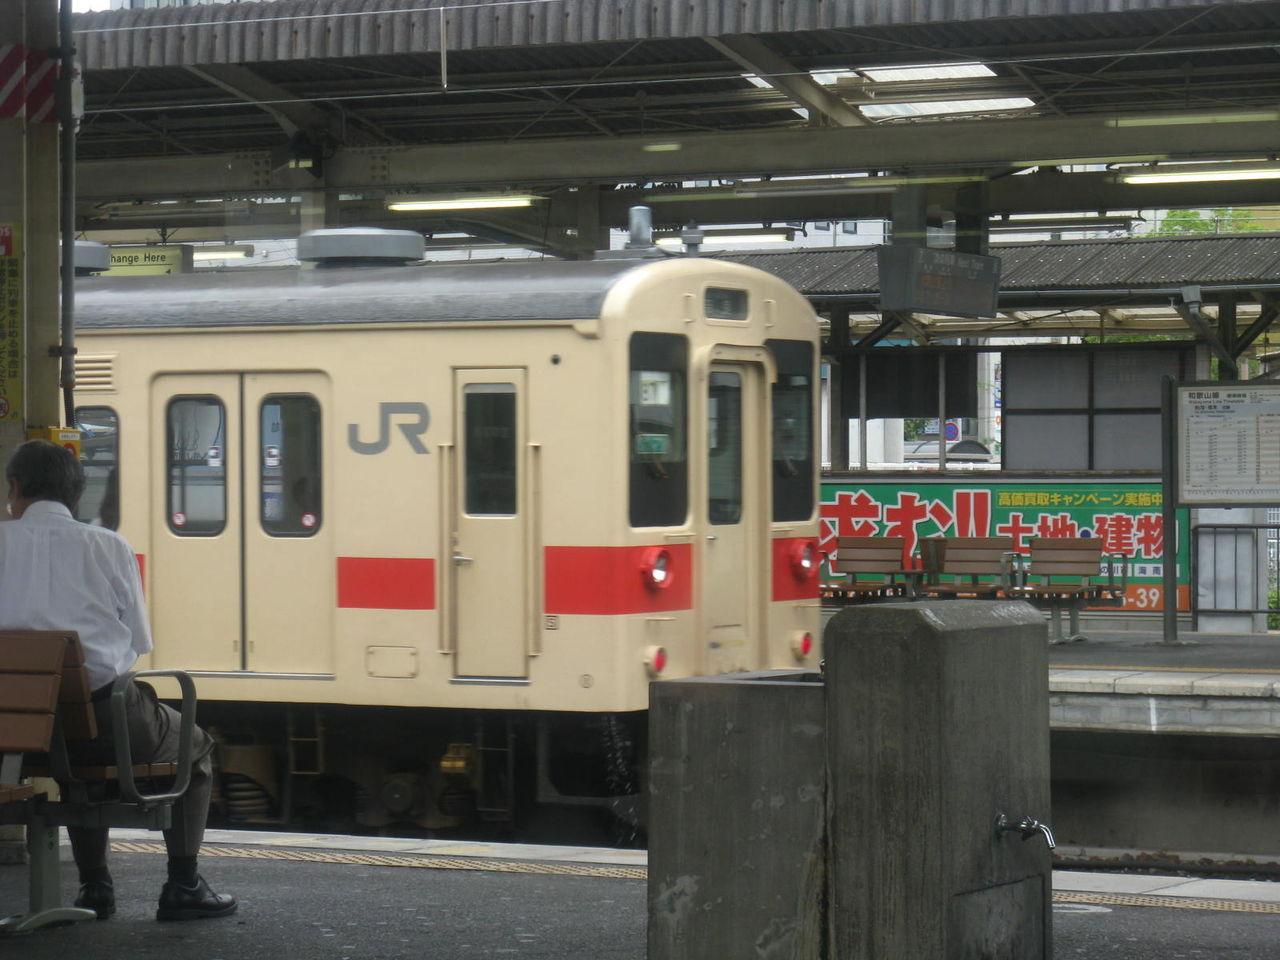 https://livedoor.blogimg.jp/jre231train/imgs/a/c/acc9f2c5.jpg